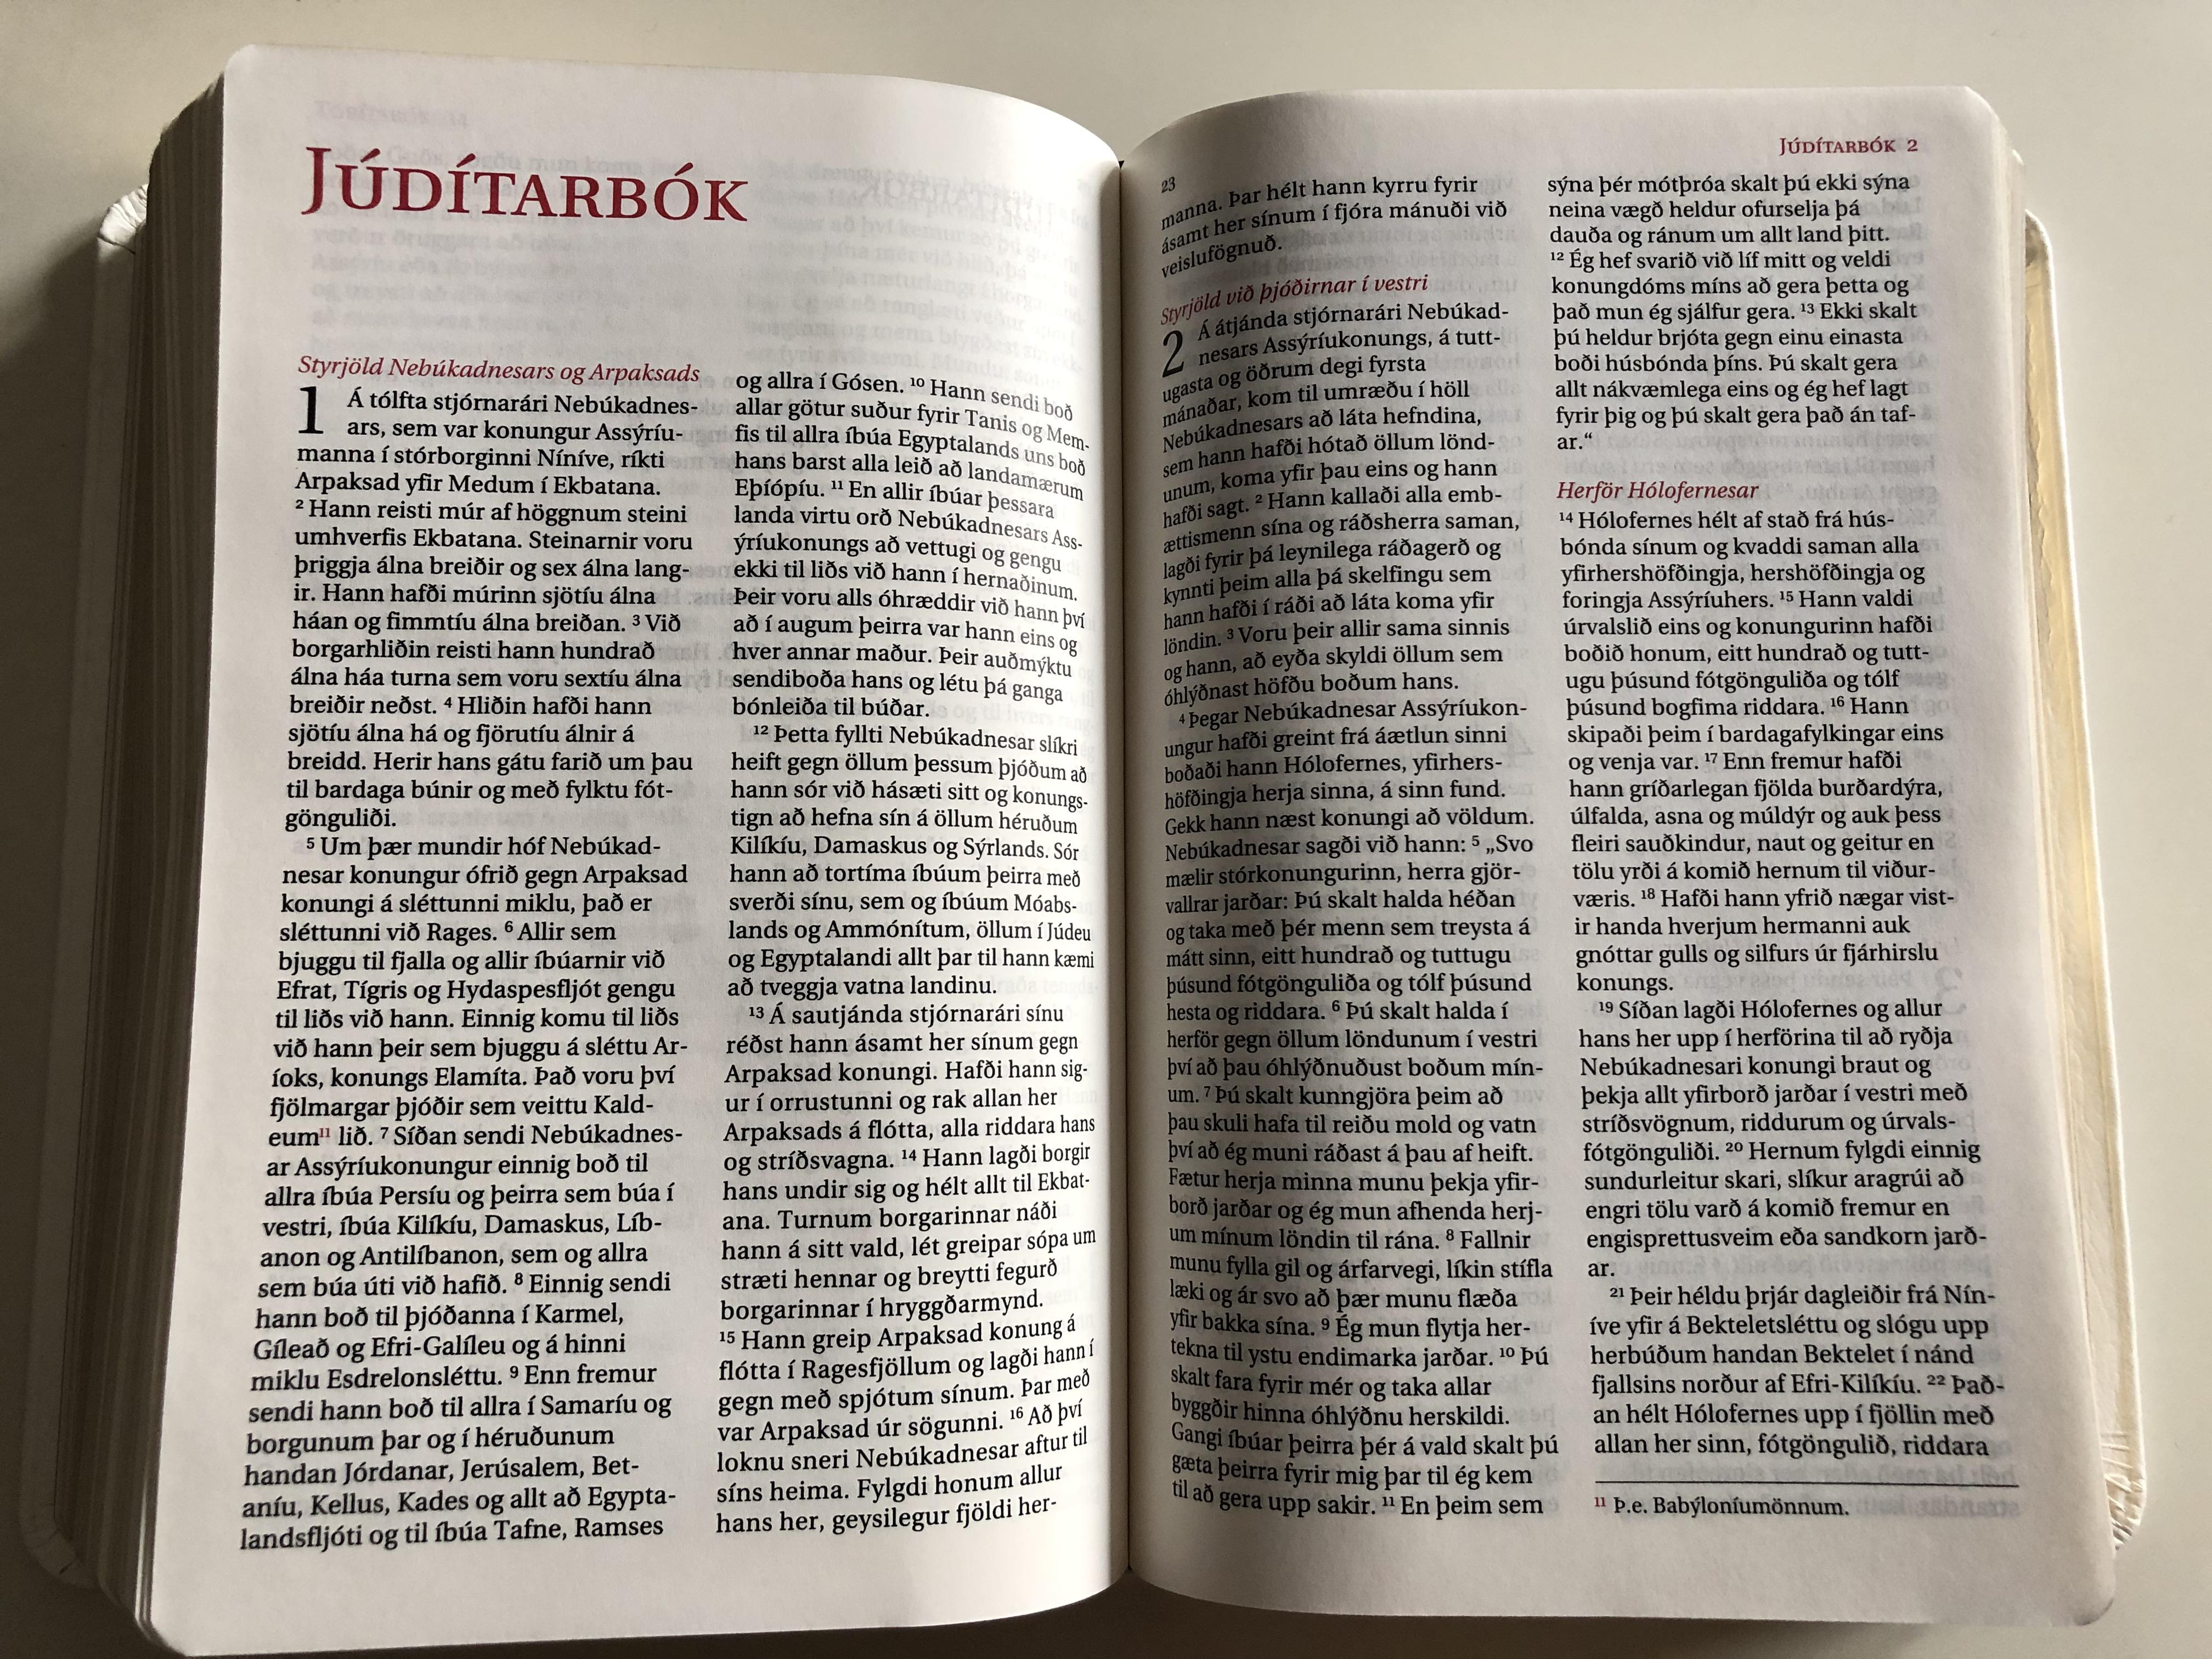 icelandic-catholic-bible-bibl-an-gamla-testamenti-samt-ap-kr-fu-b-kunum-n-ja-testamenti-20.jpg